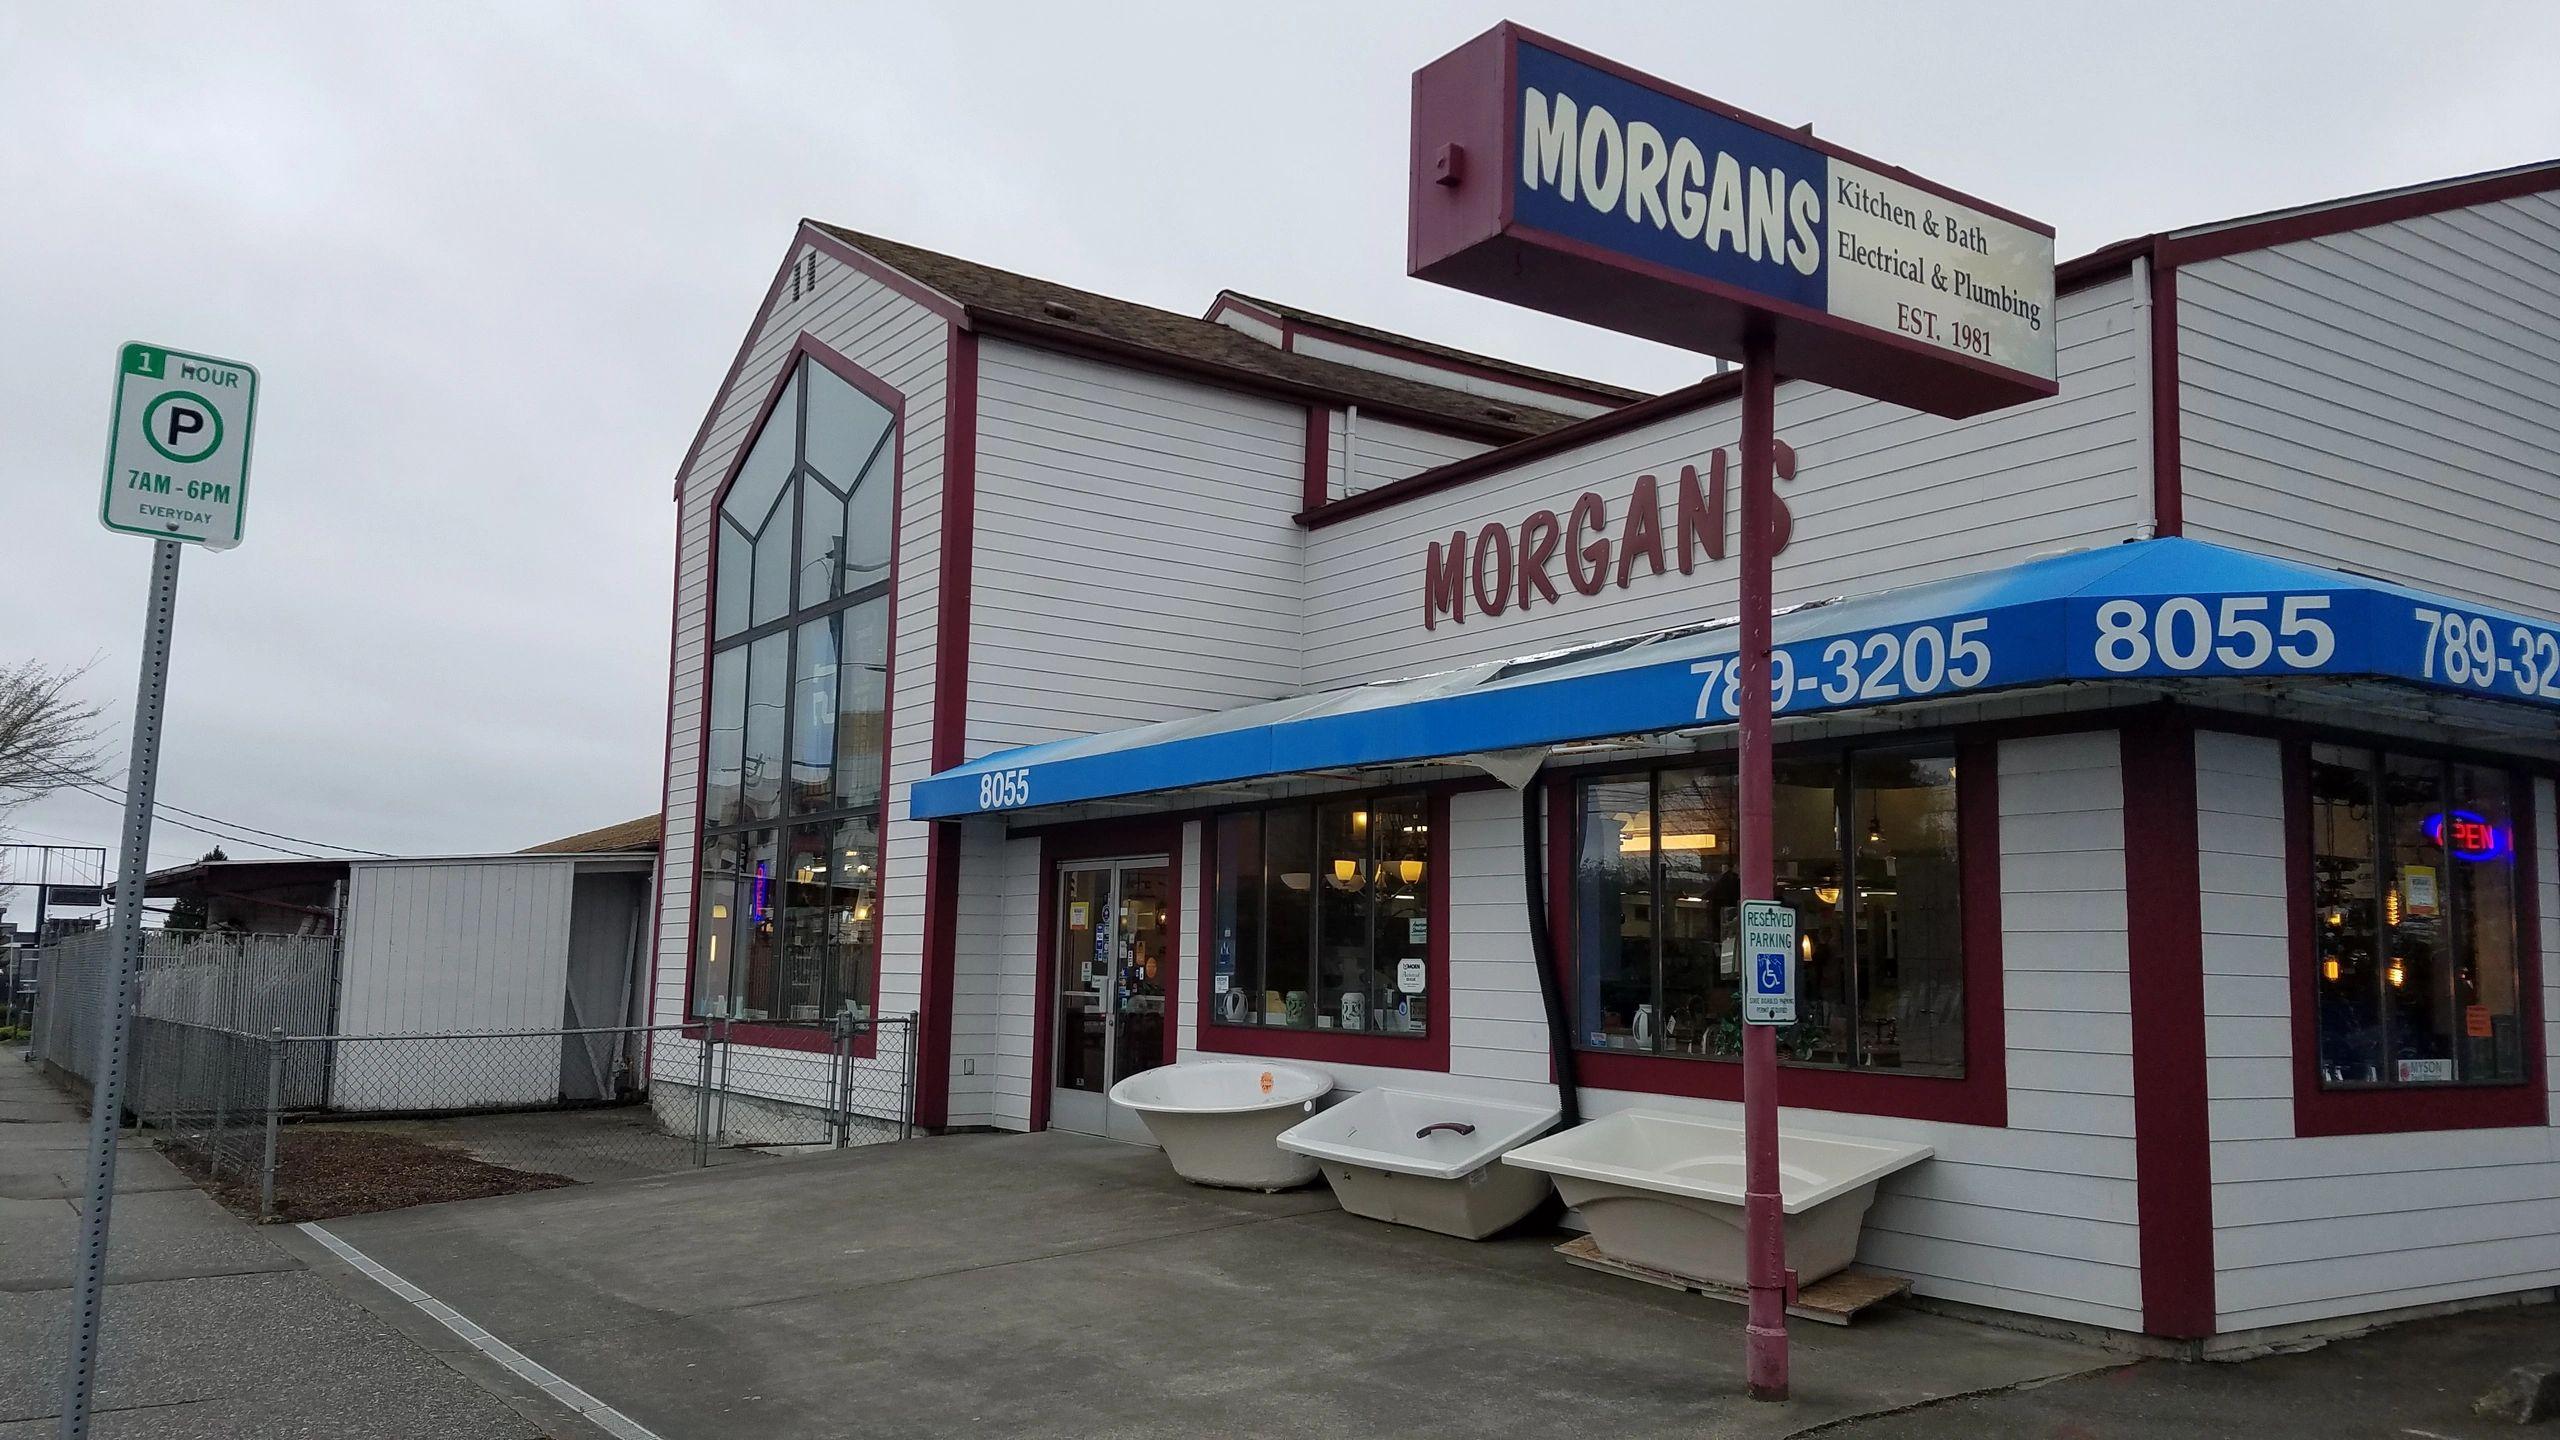 morgans kitchen, bath, electric & plumbing - home